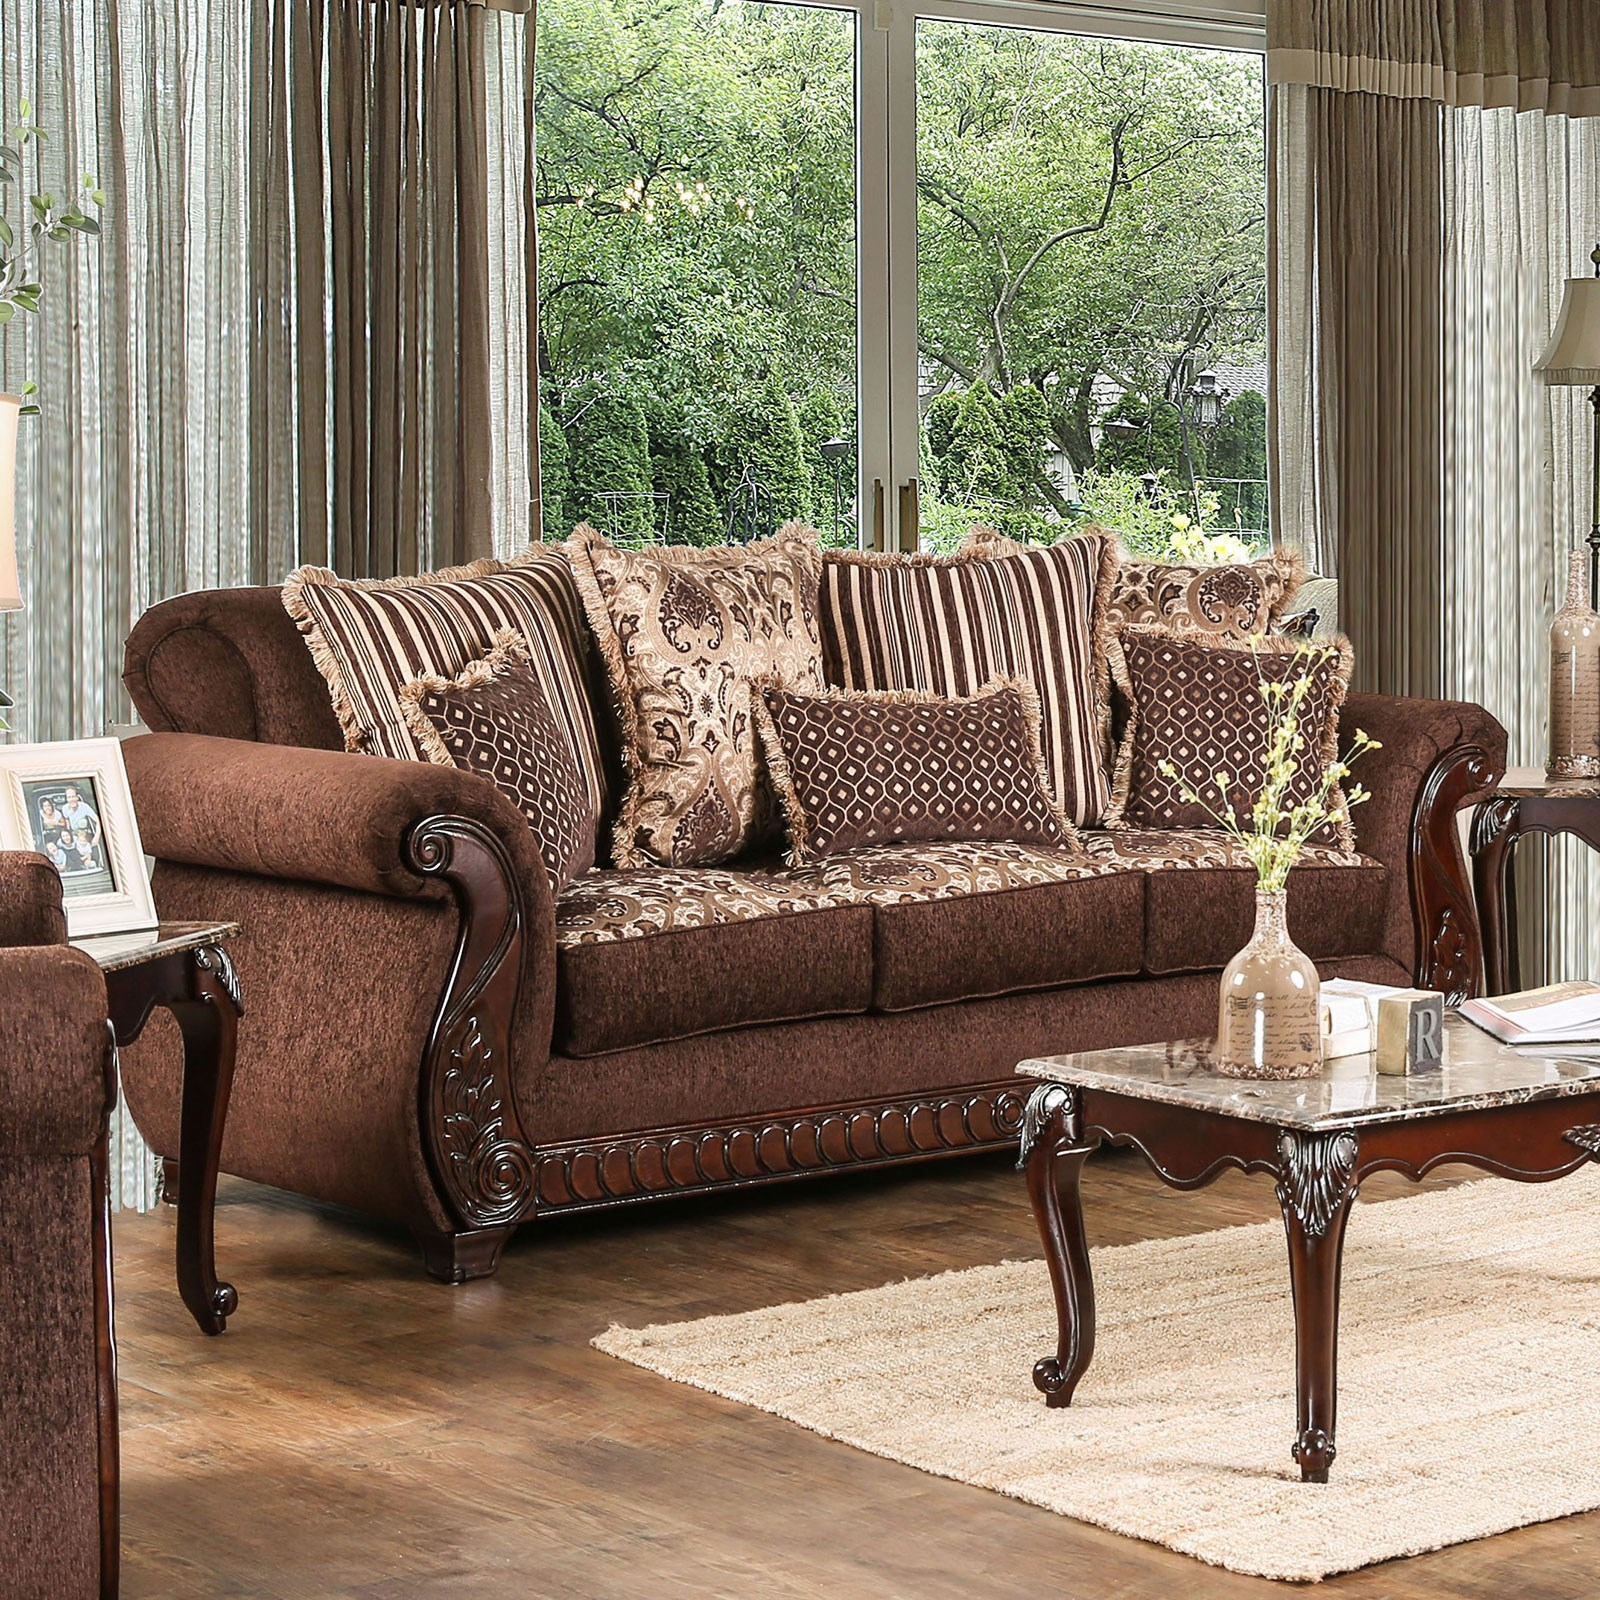 Tabitha Sofa at Household Furniture